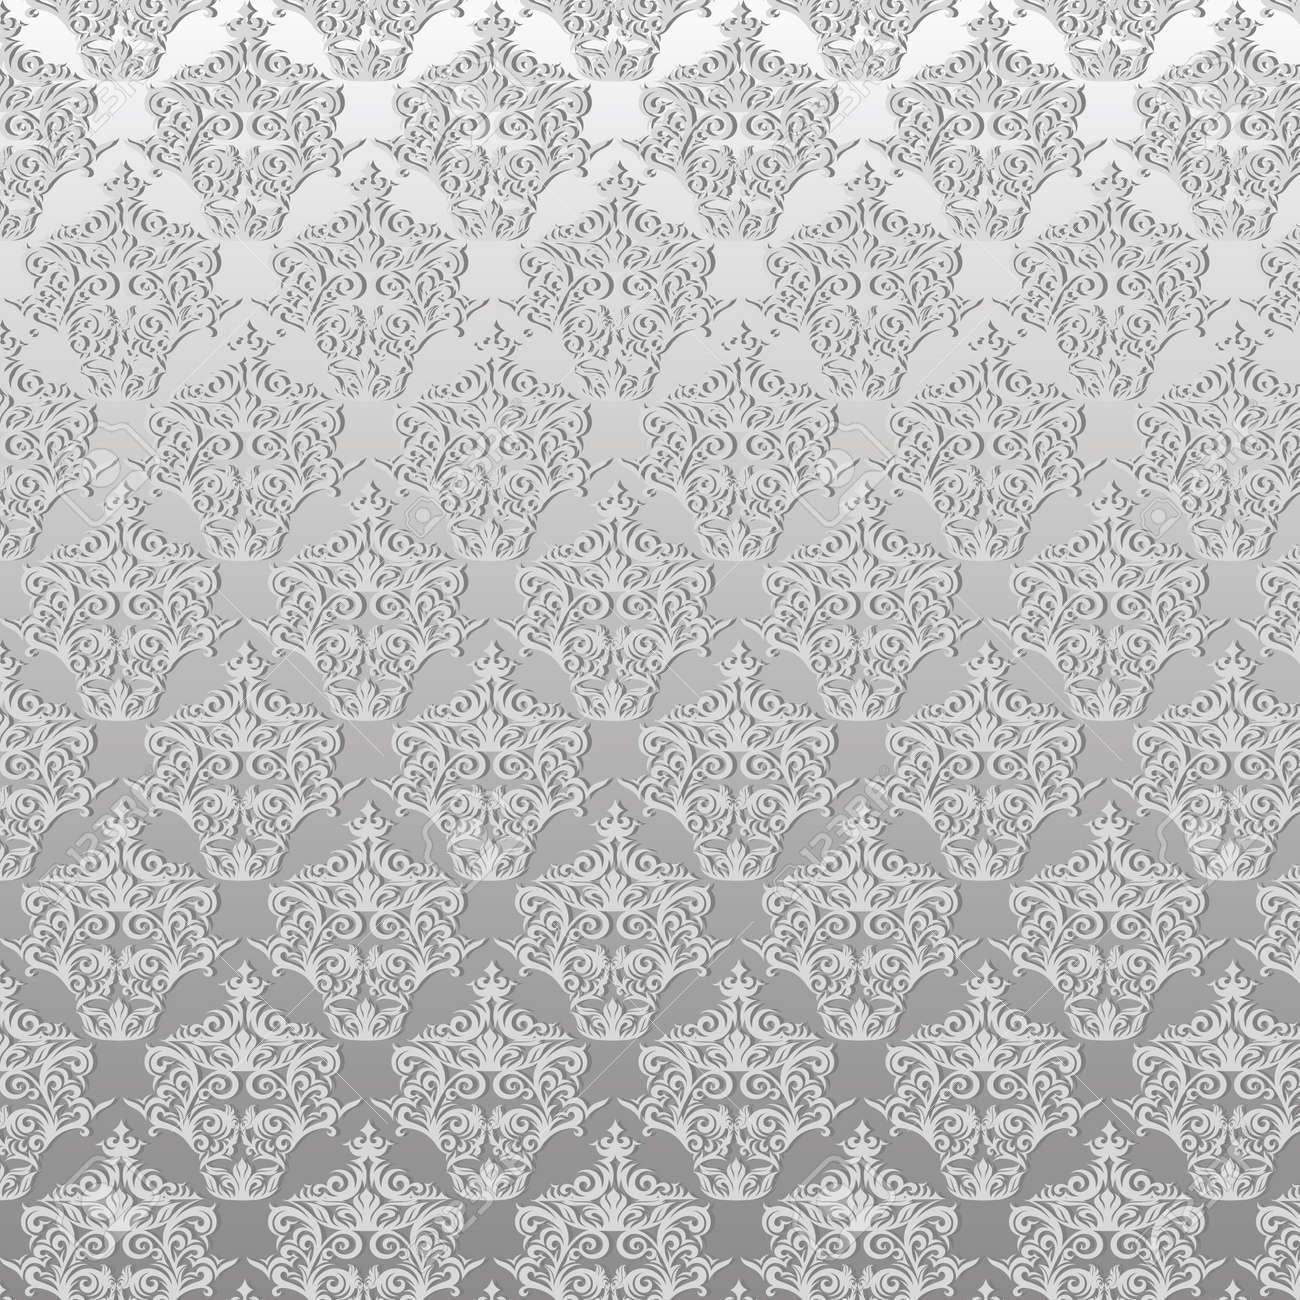 Damask seamless floral pattern Stock Photo - 18198514